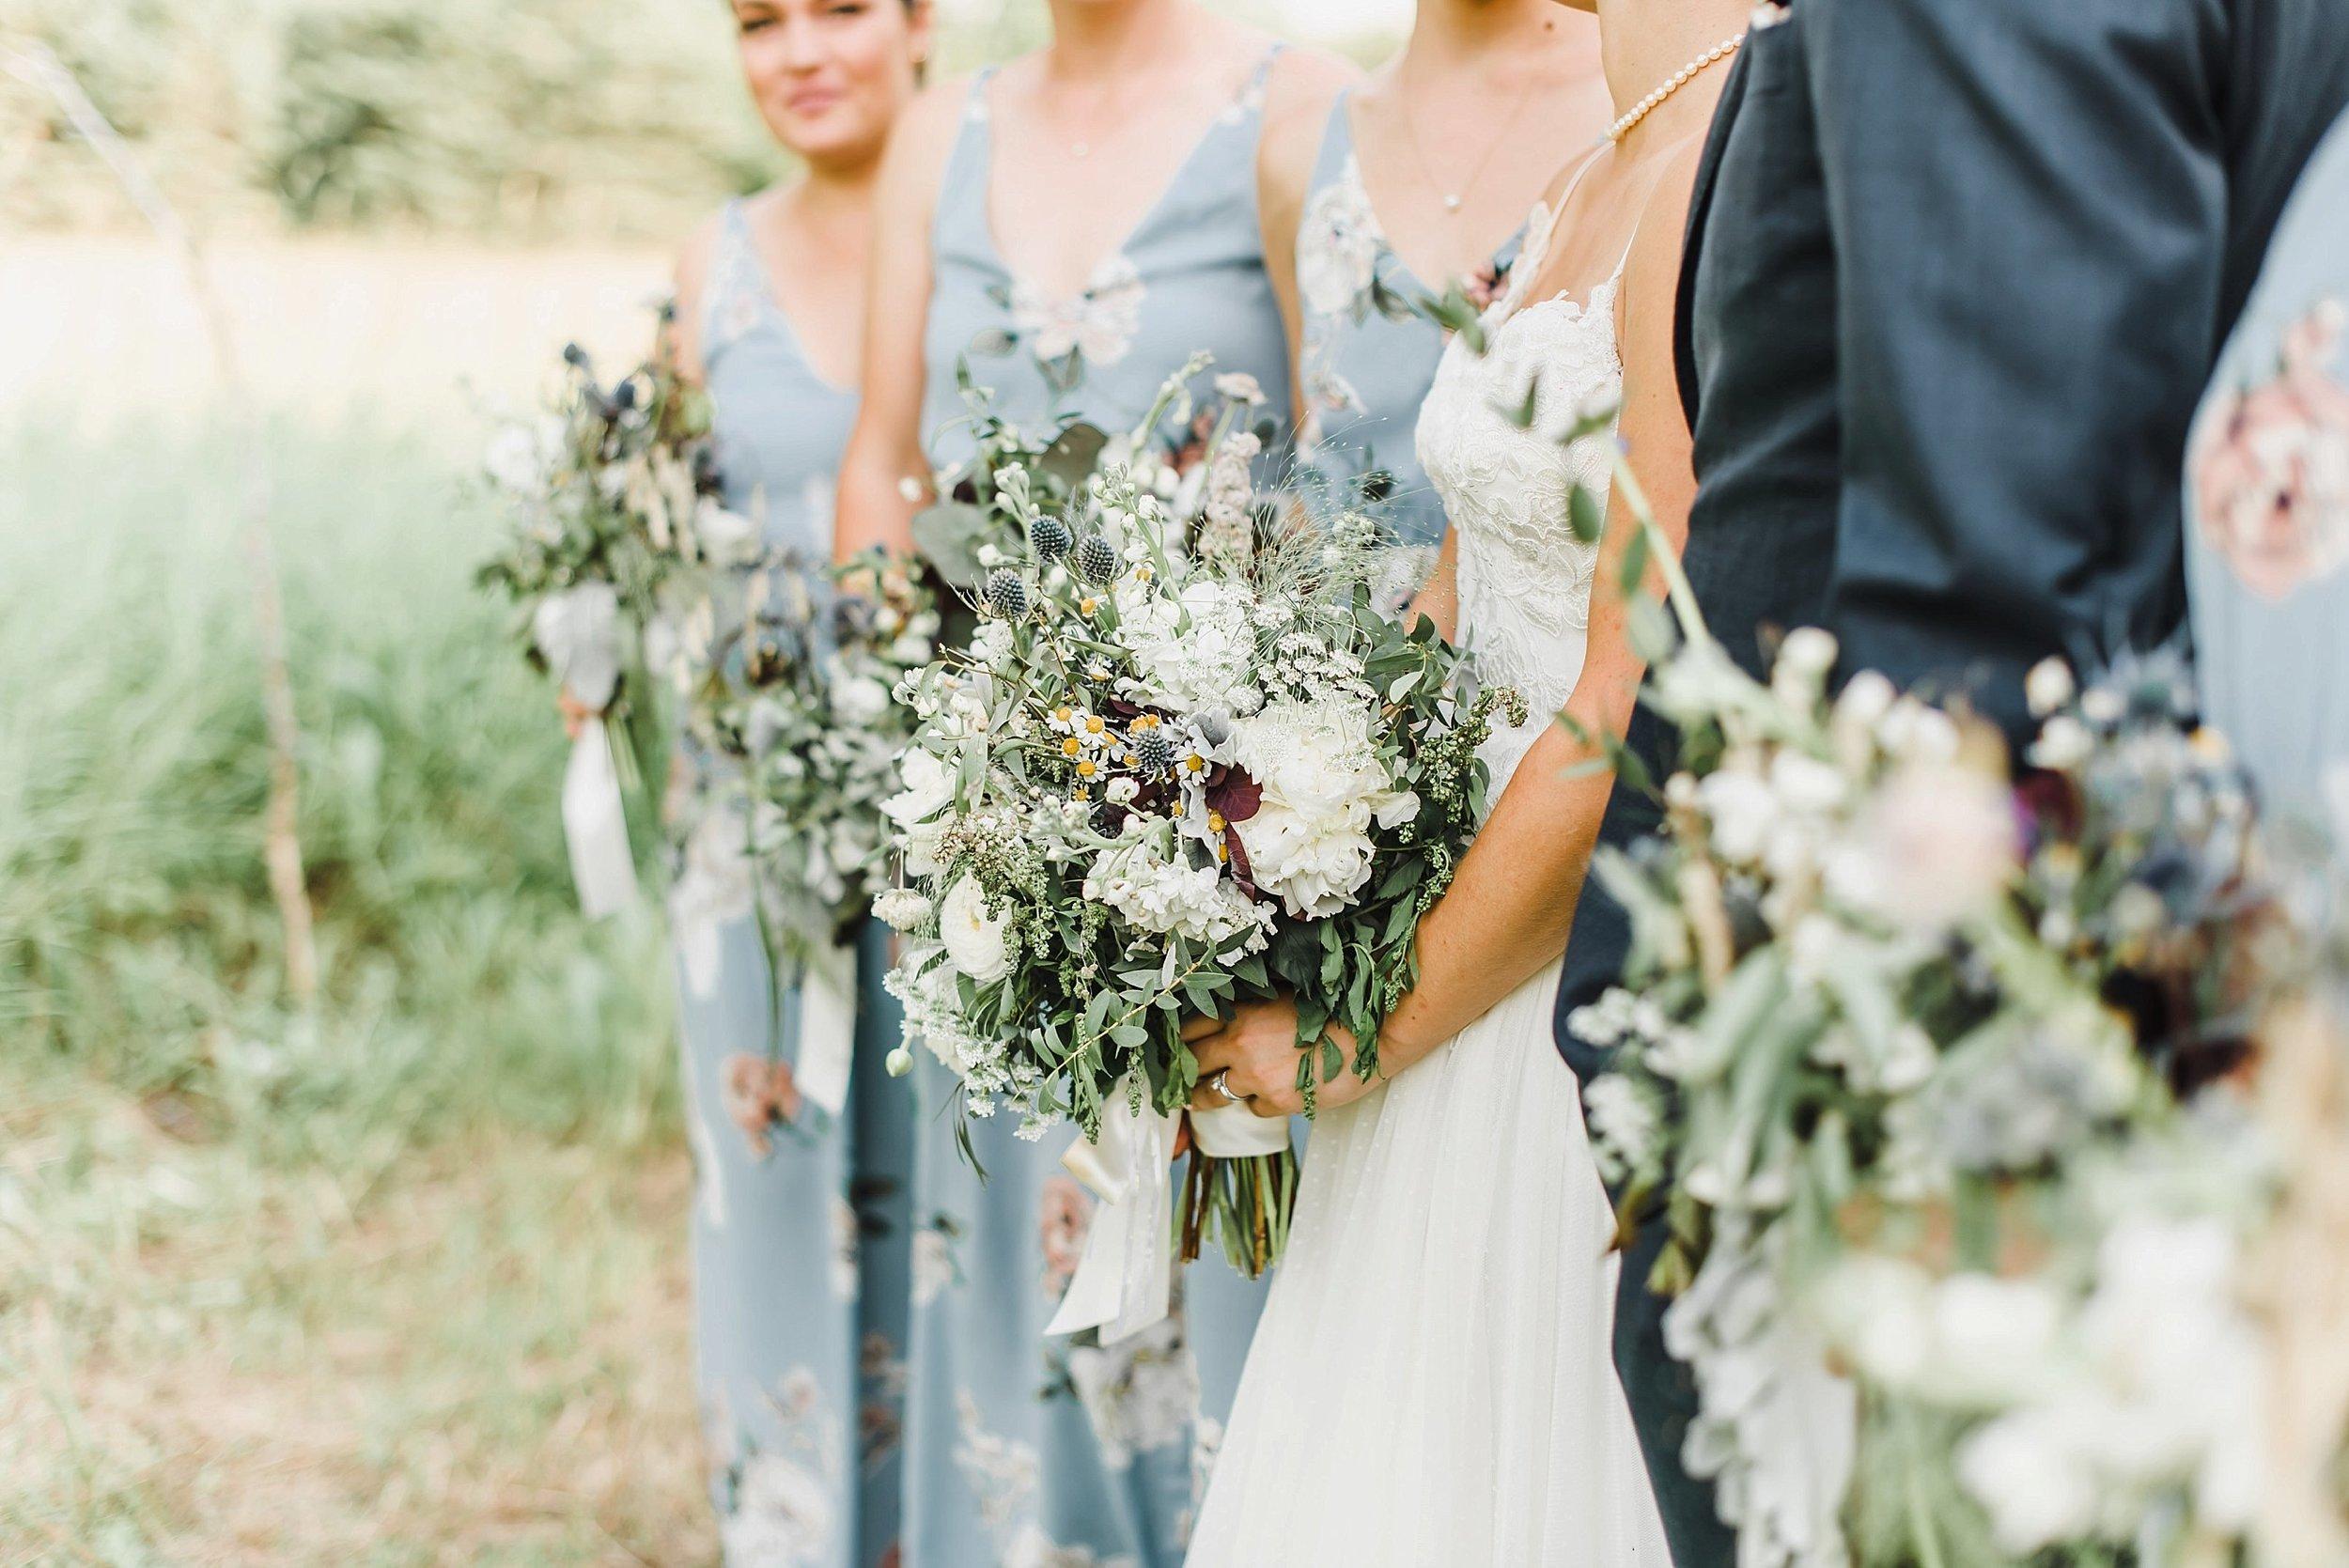 light airy indie fine art ottawa wedding photographer | Ali and Batoul Photography_0832.jpg